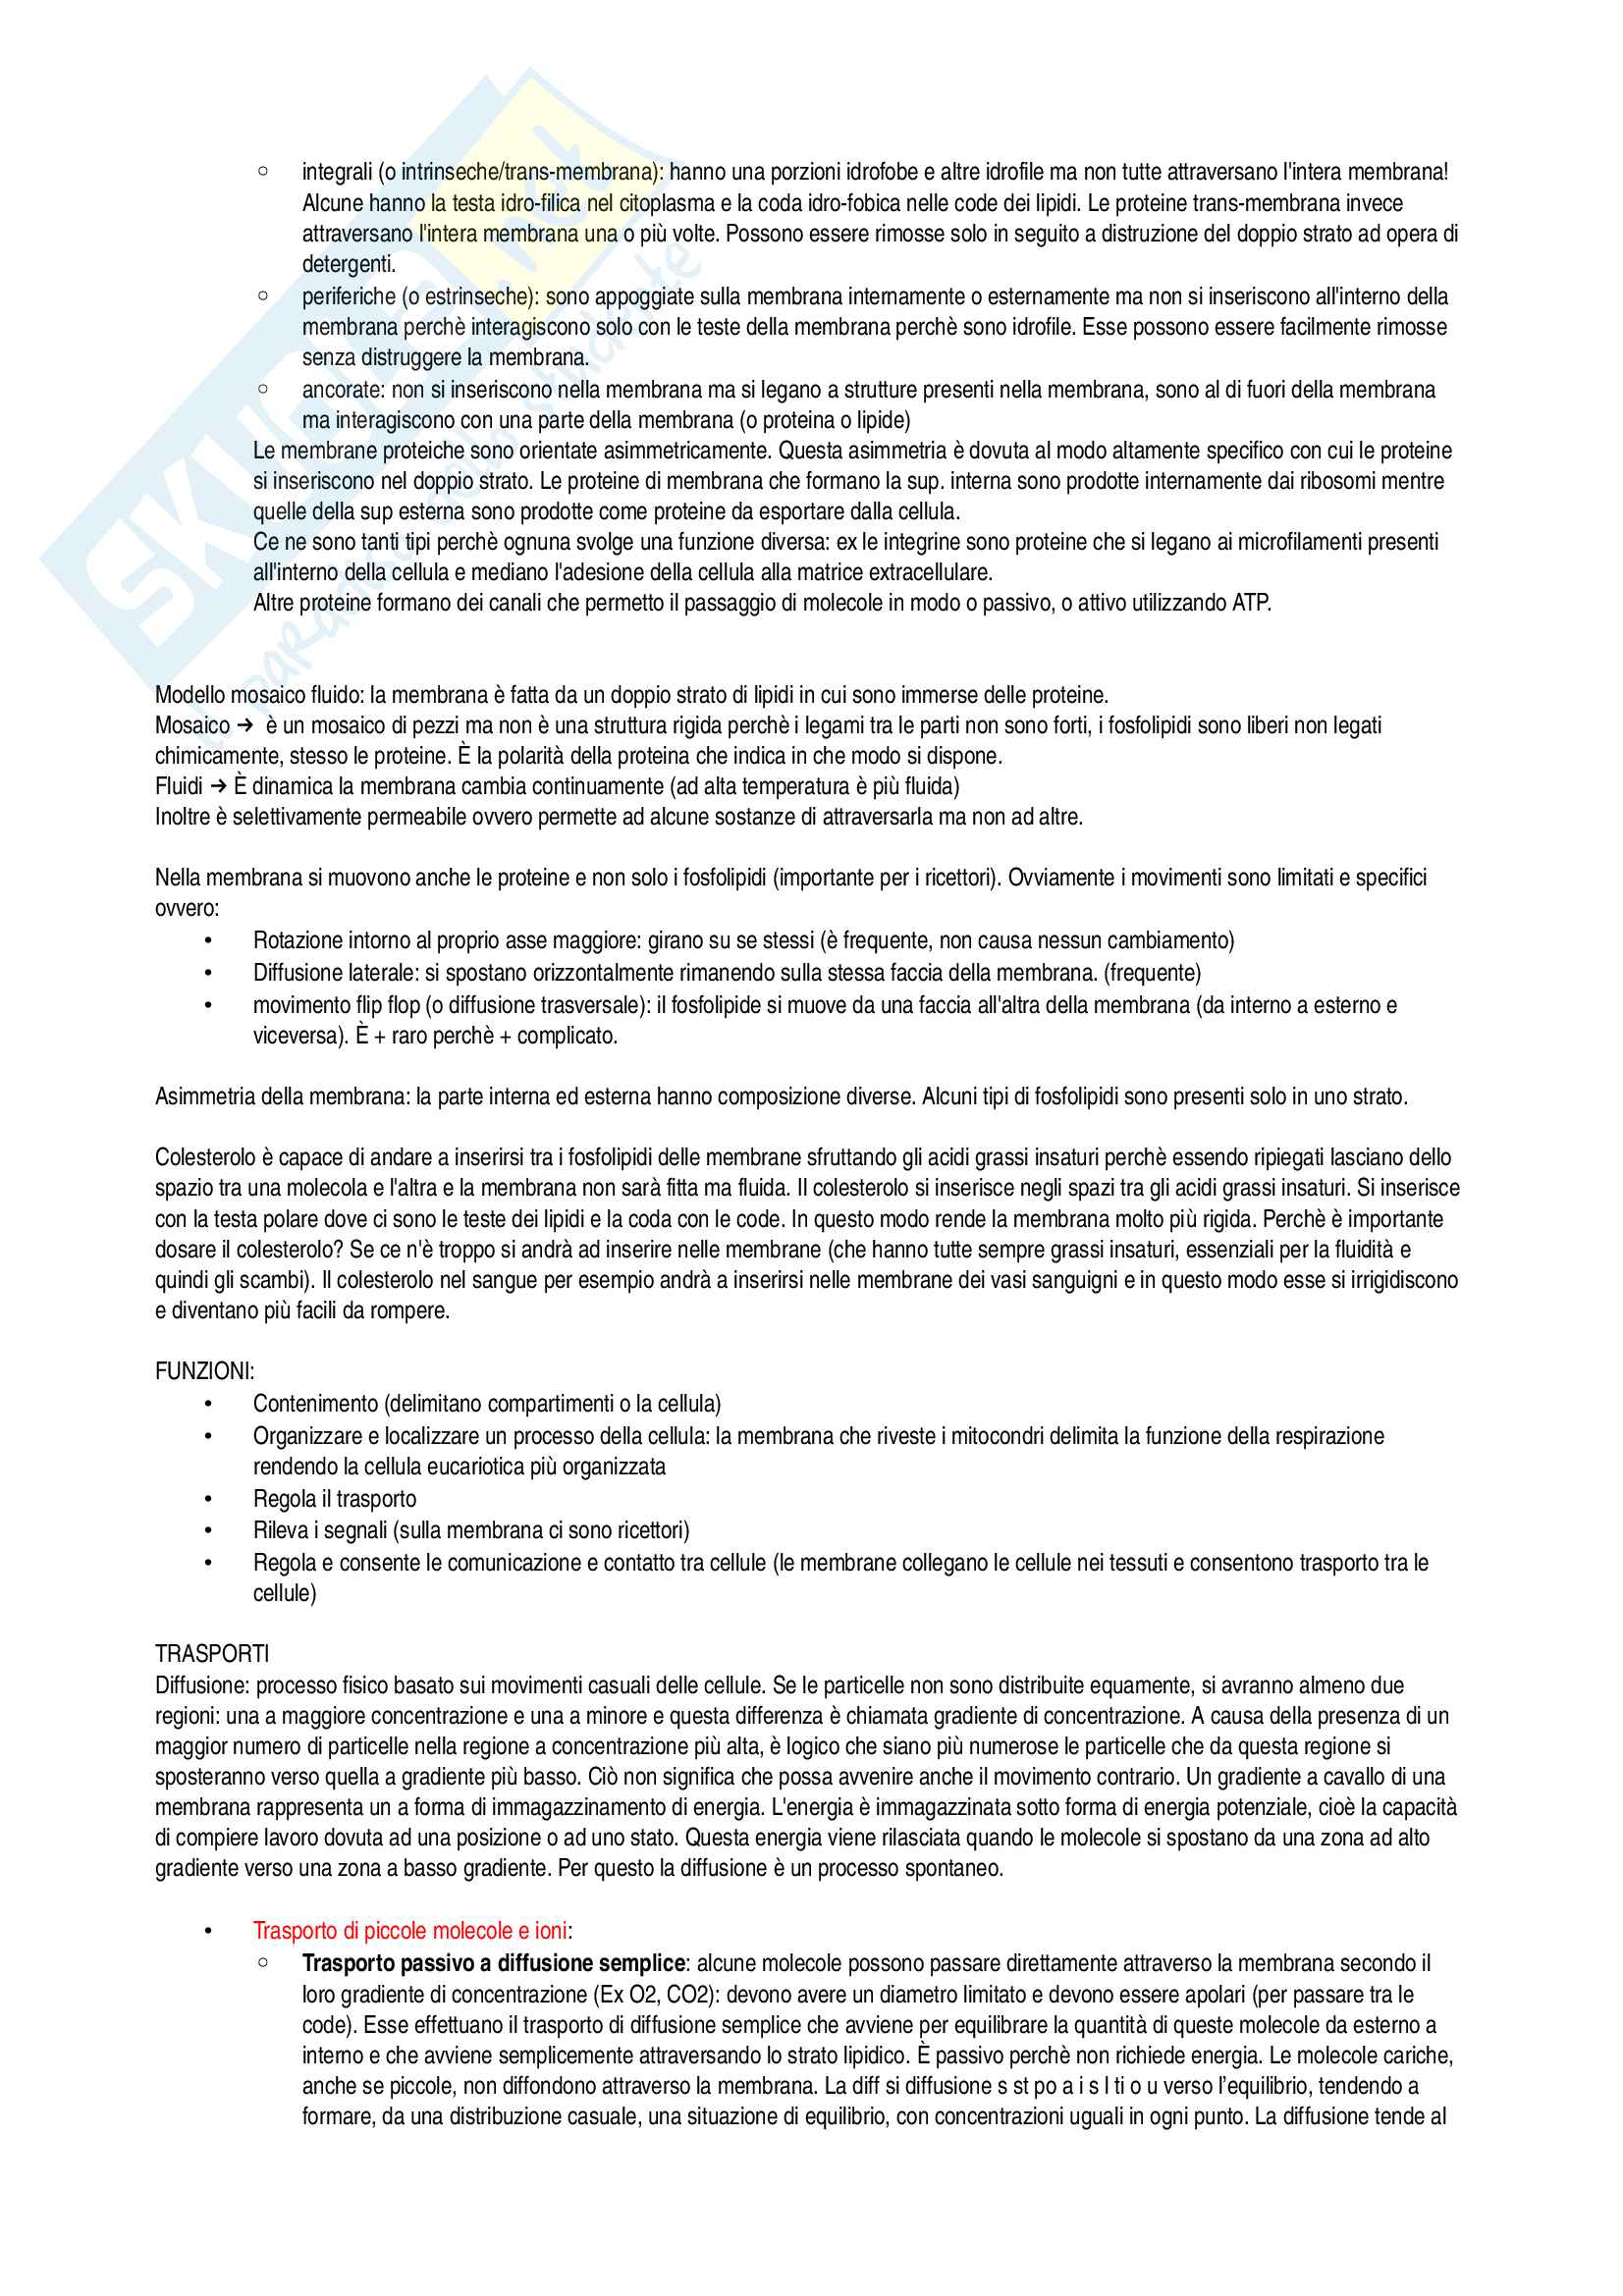 Biologia e Genetica- Esame completo Pag. 6